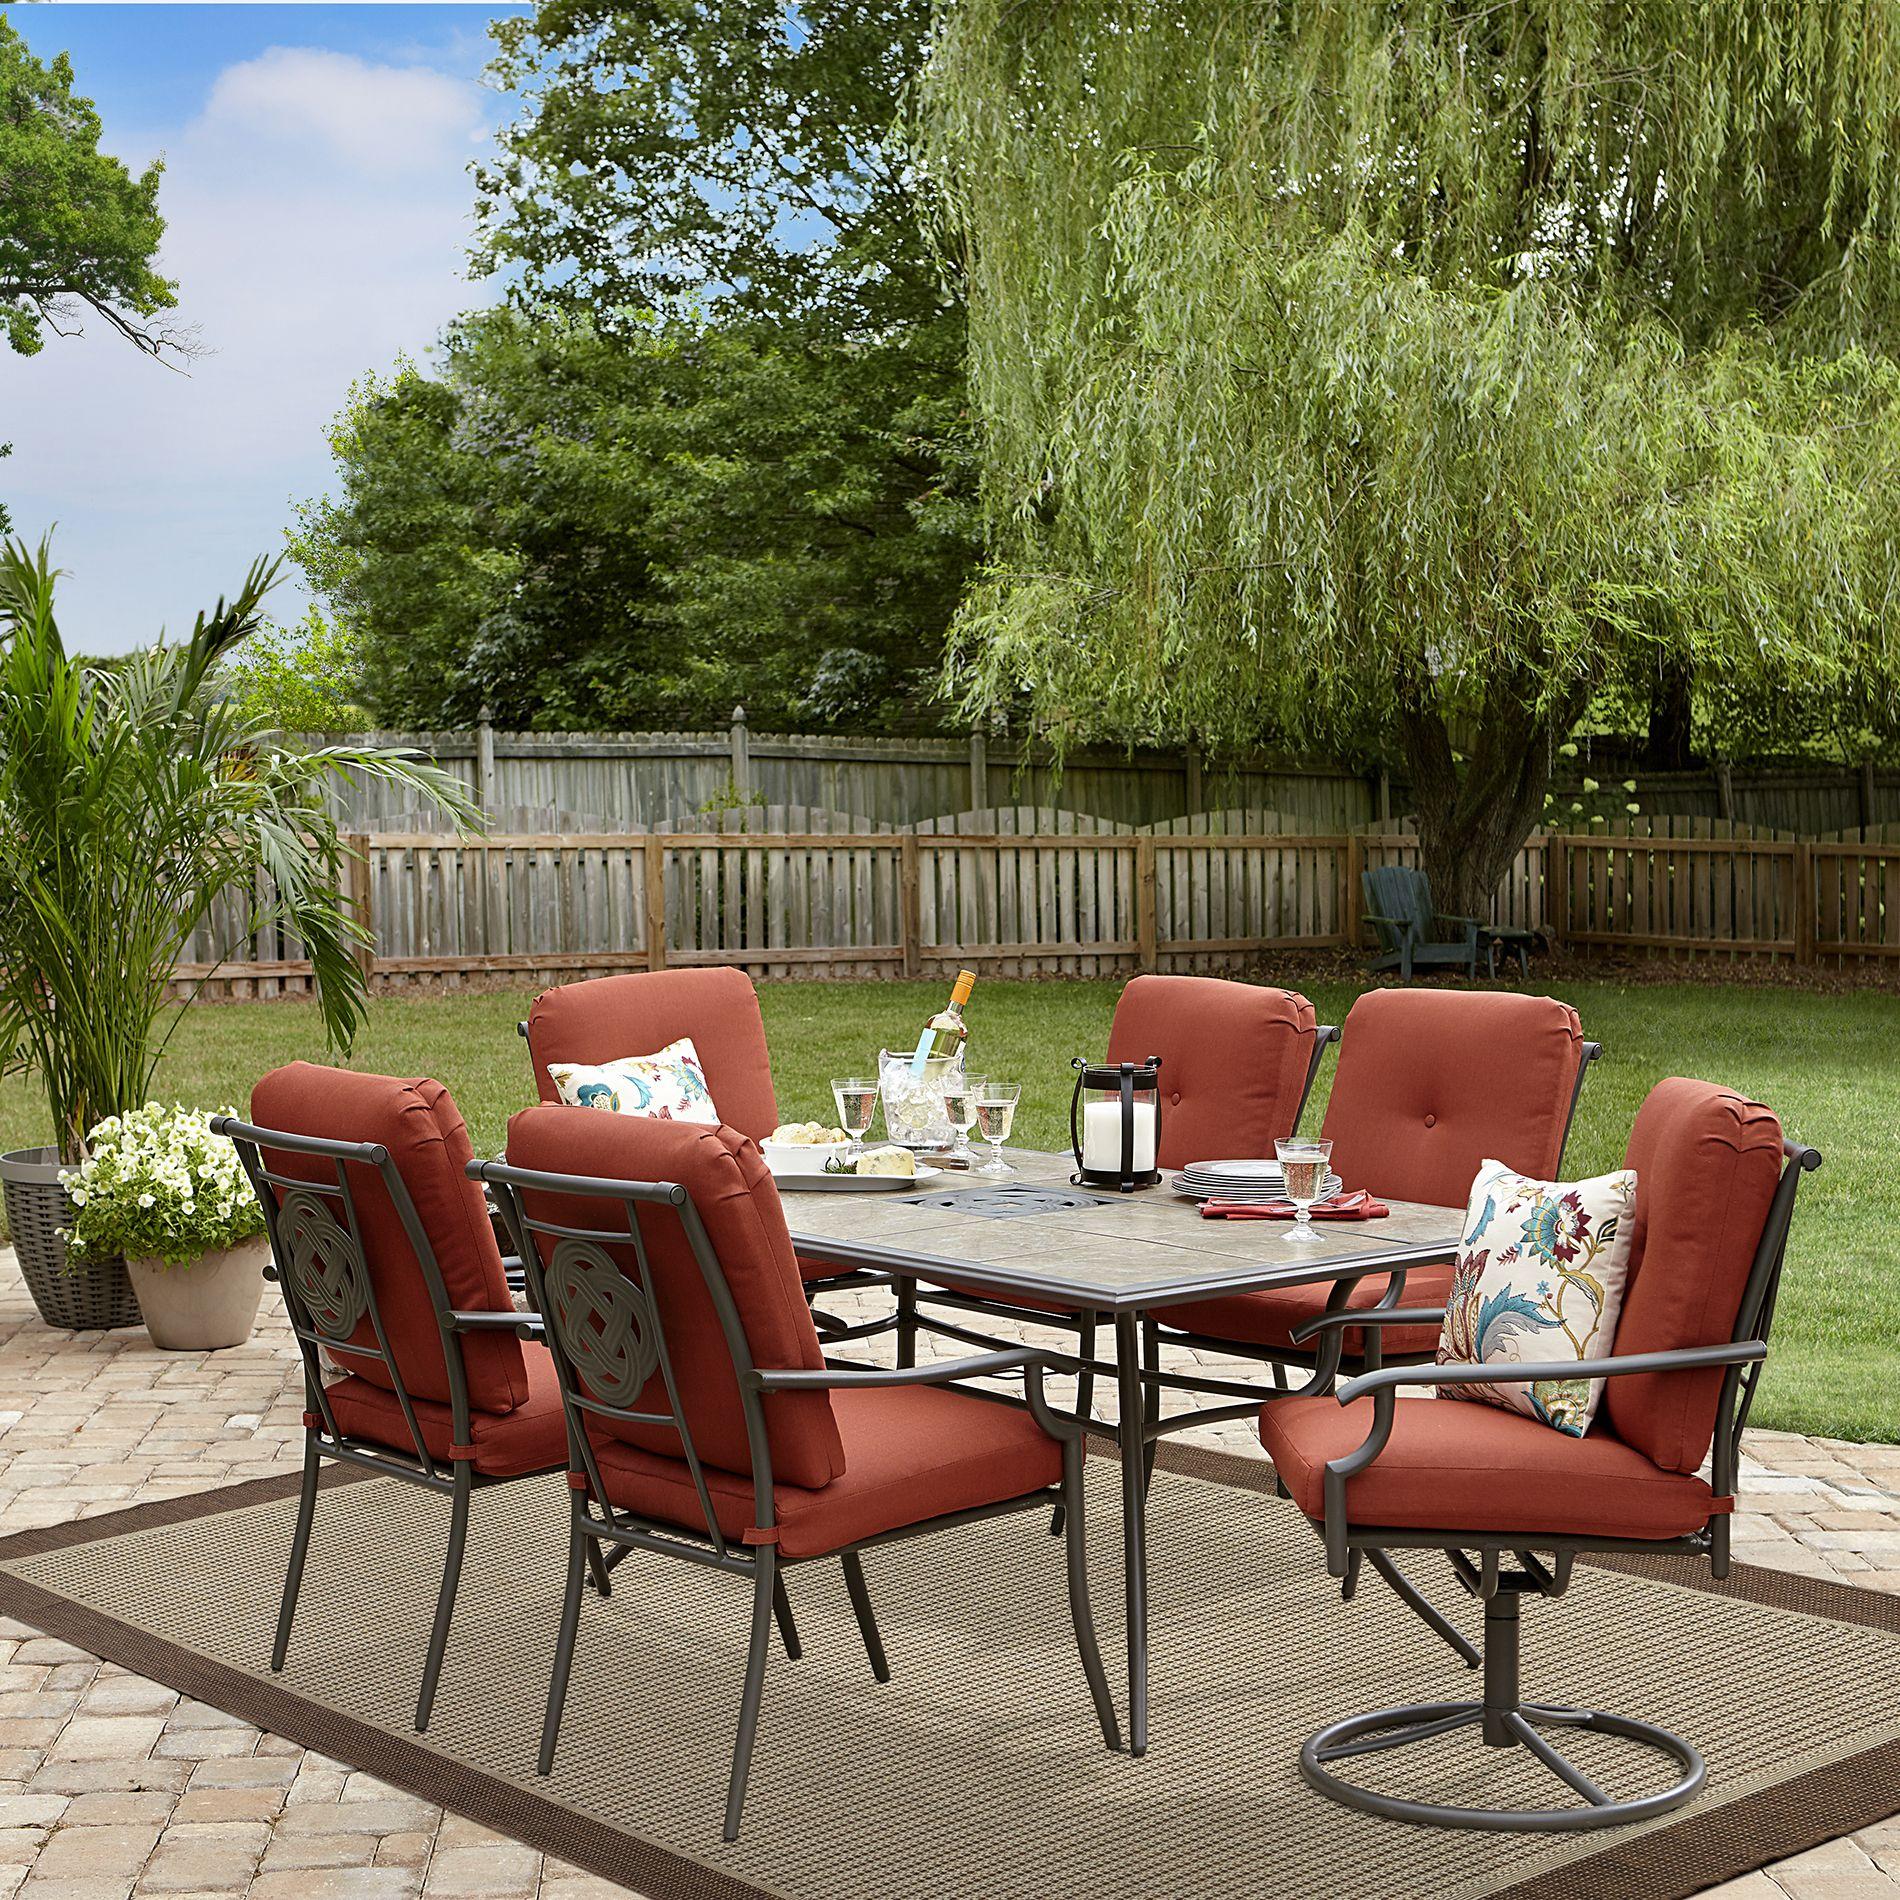 Outdoor Garden Oasis Brookston 7 Pc Ceramic Top Dining Set Red